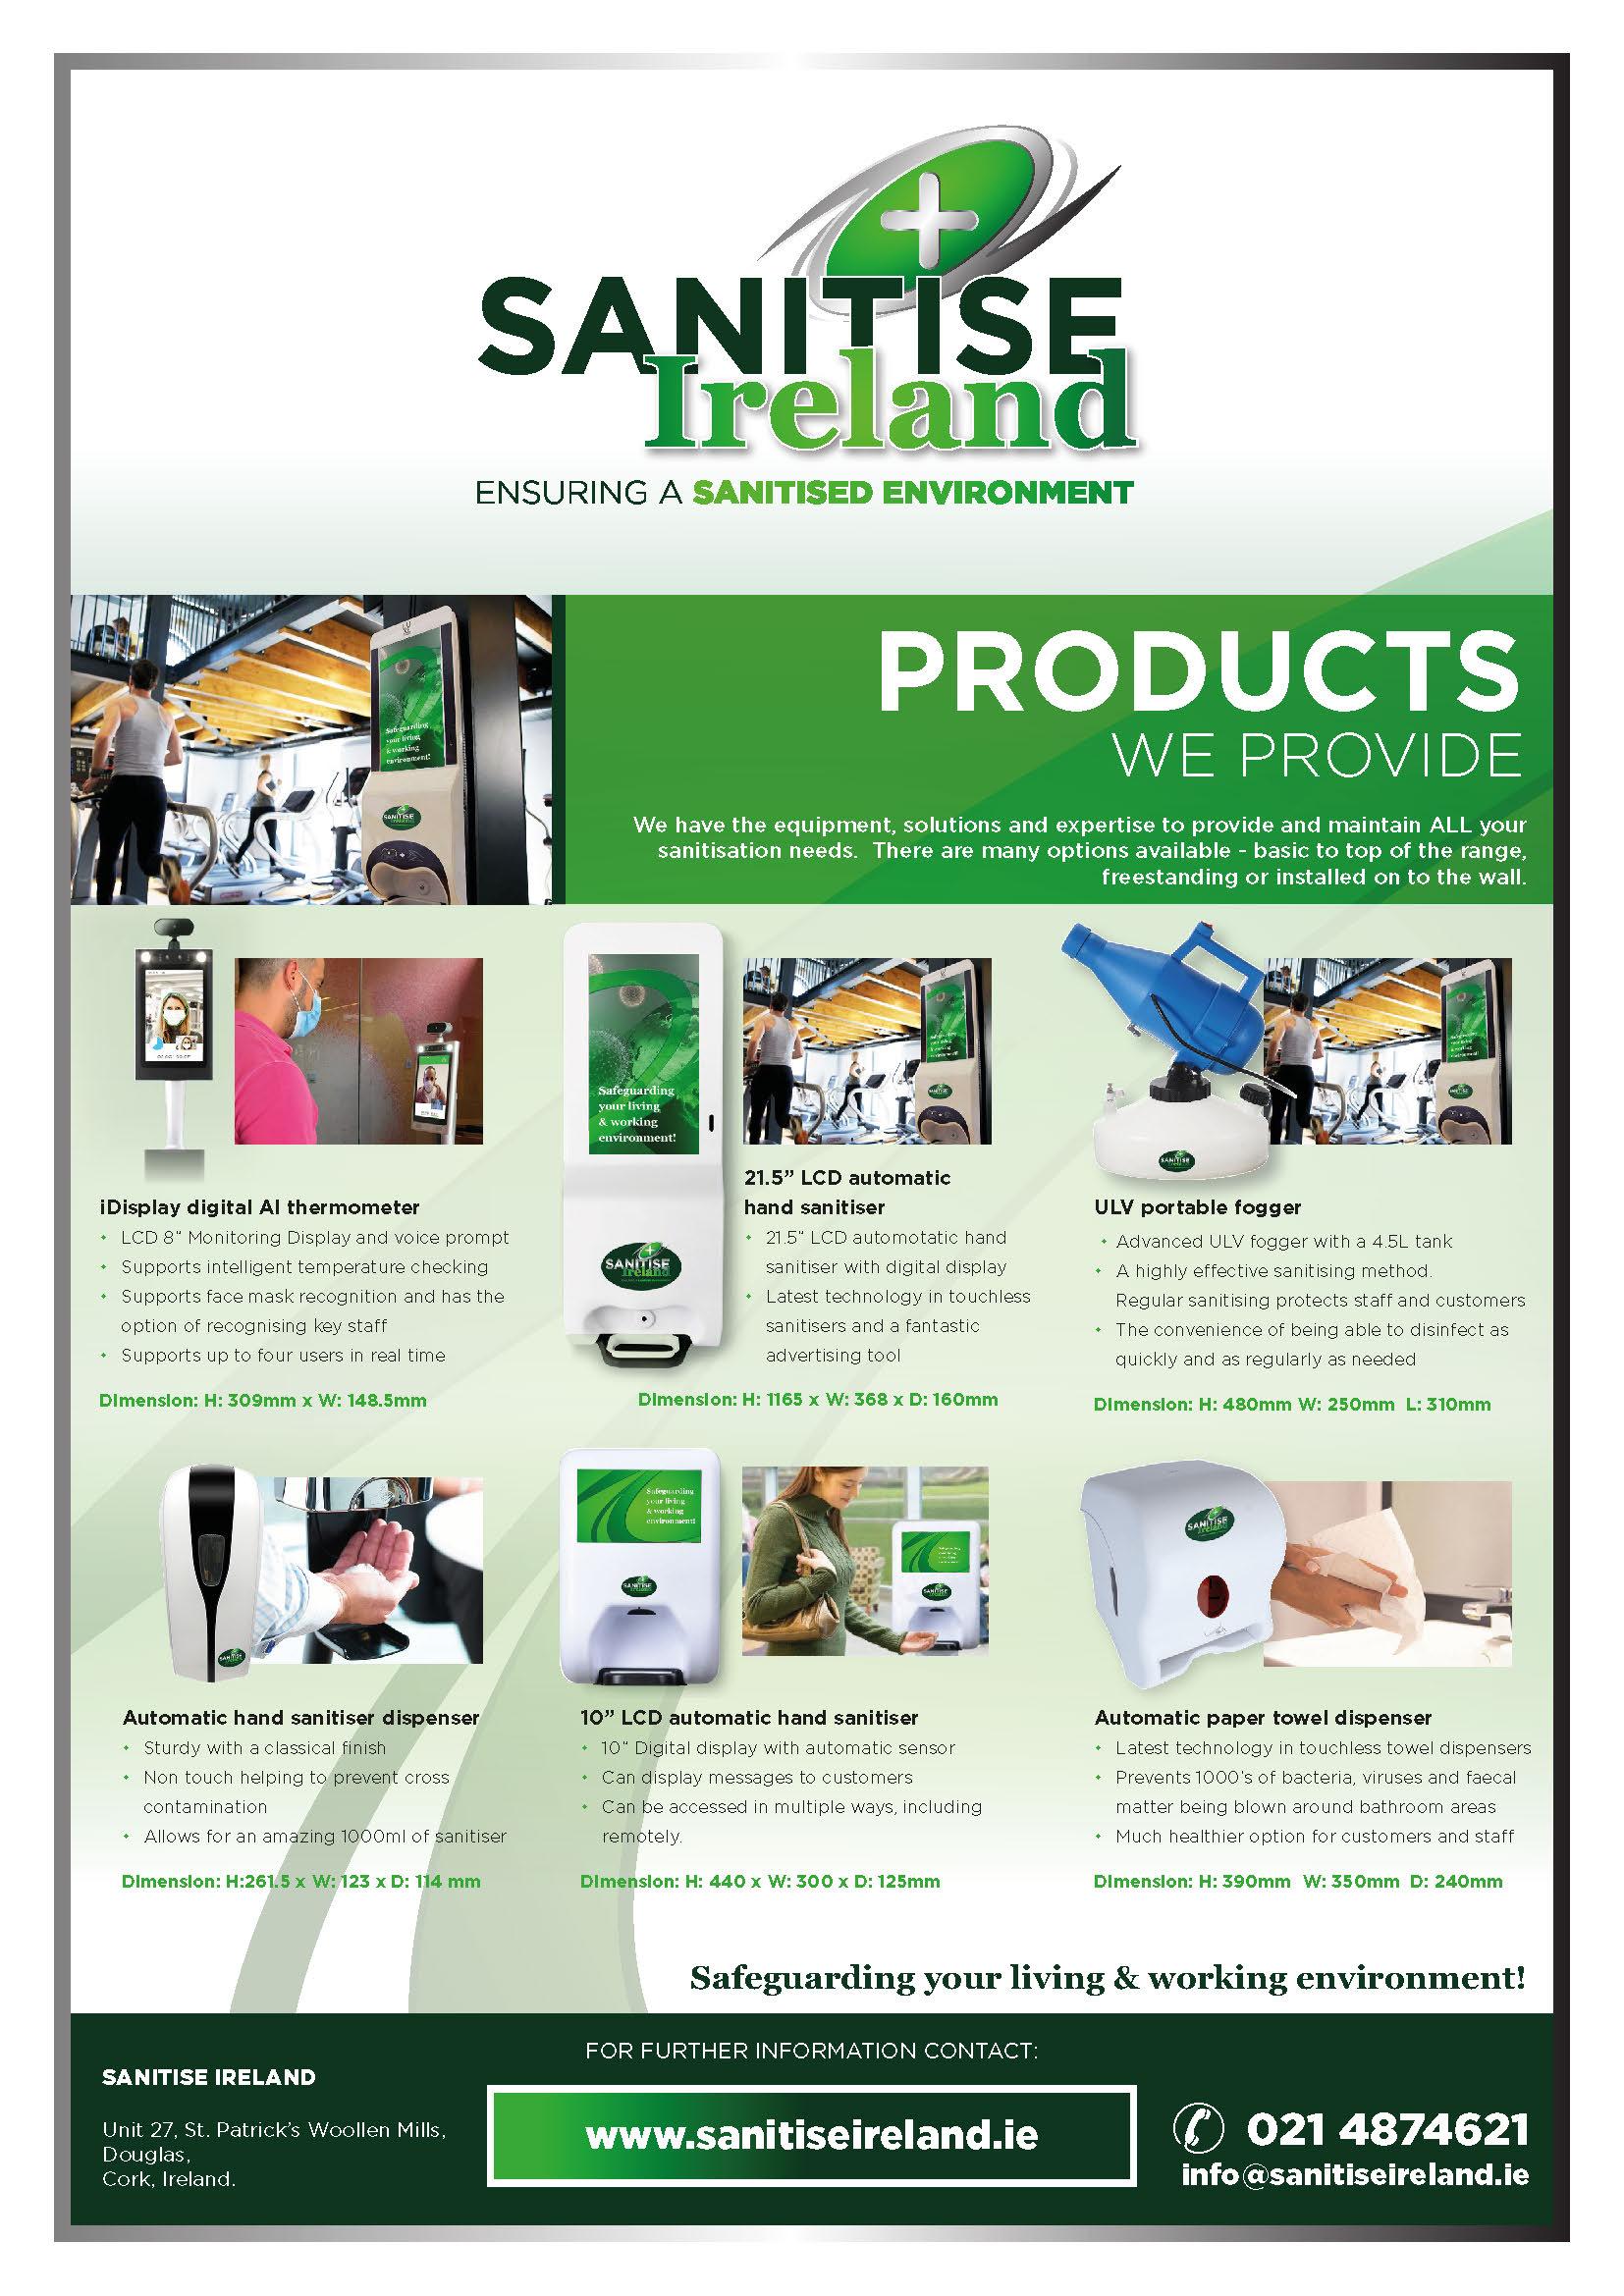 Santise Ireland - Products Insert